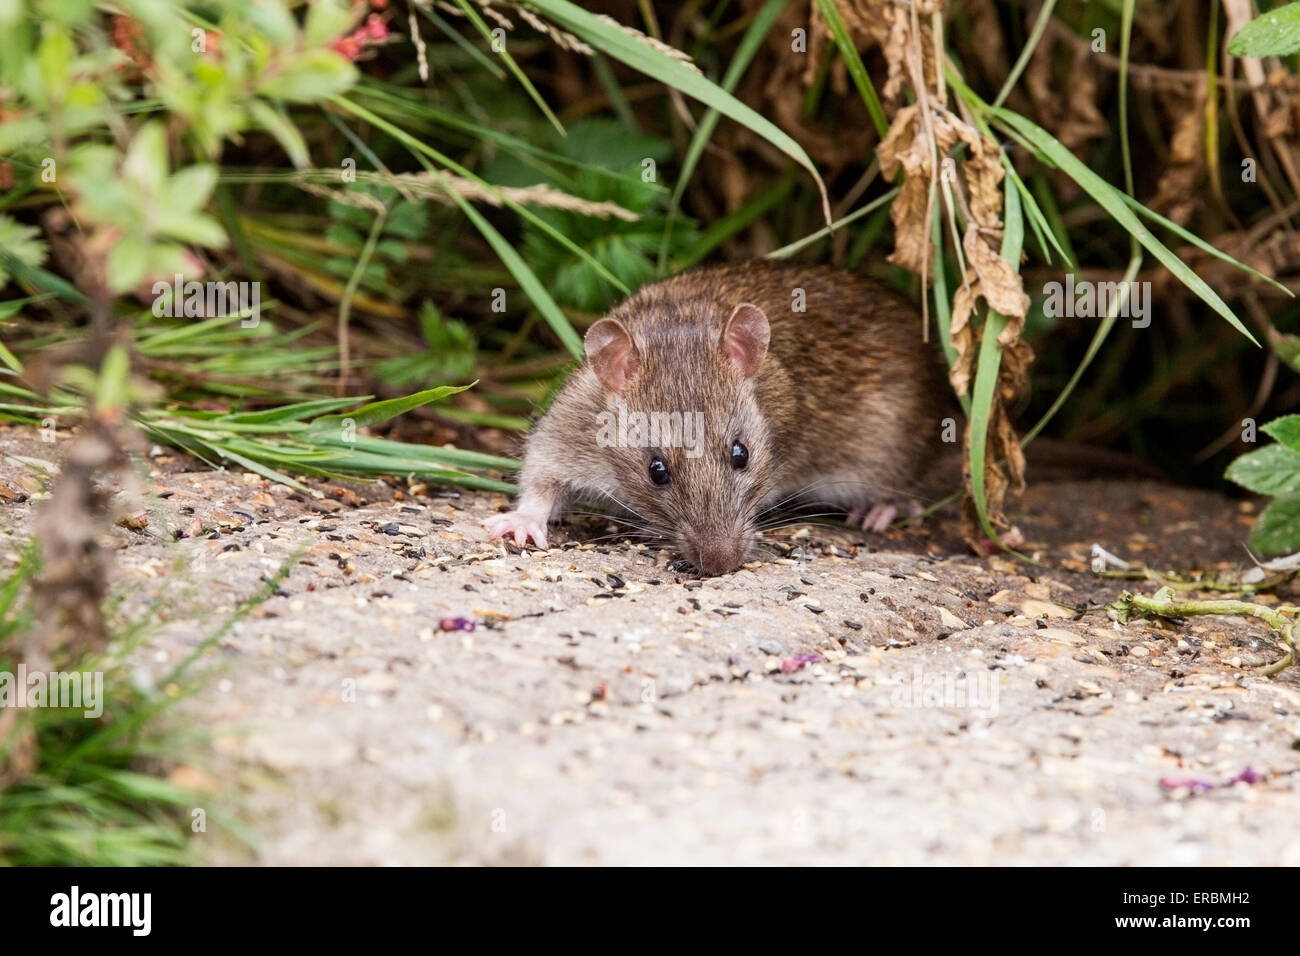 brown rat (Rattus norvegicus) feeding on grain on the ground, Norfolk, England, United Kingdom - Stock Image